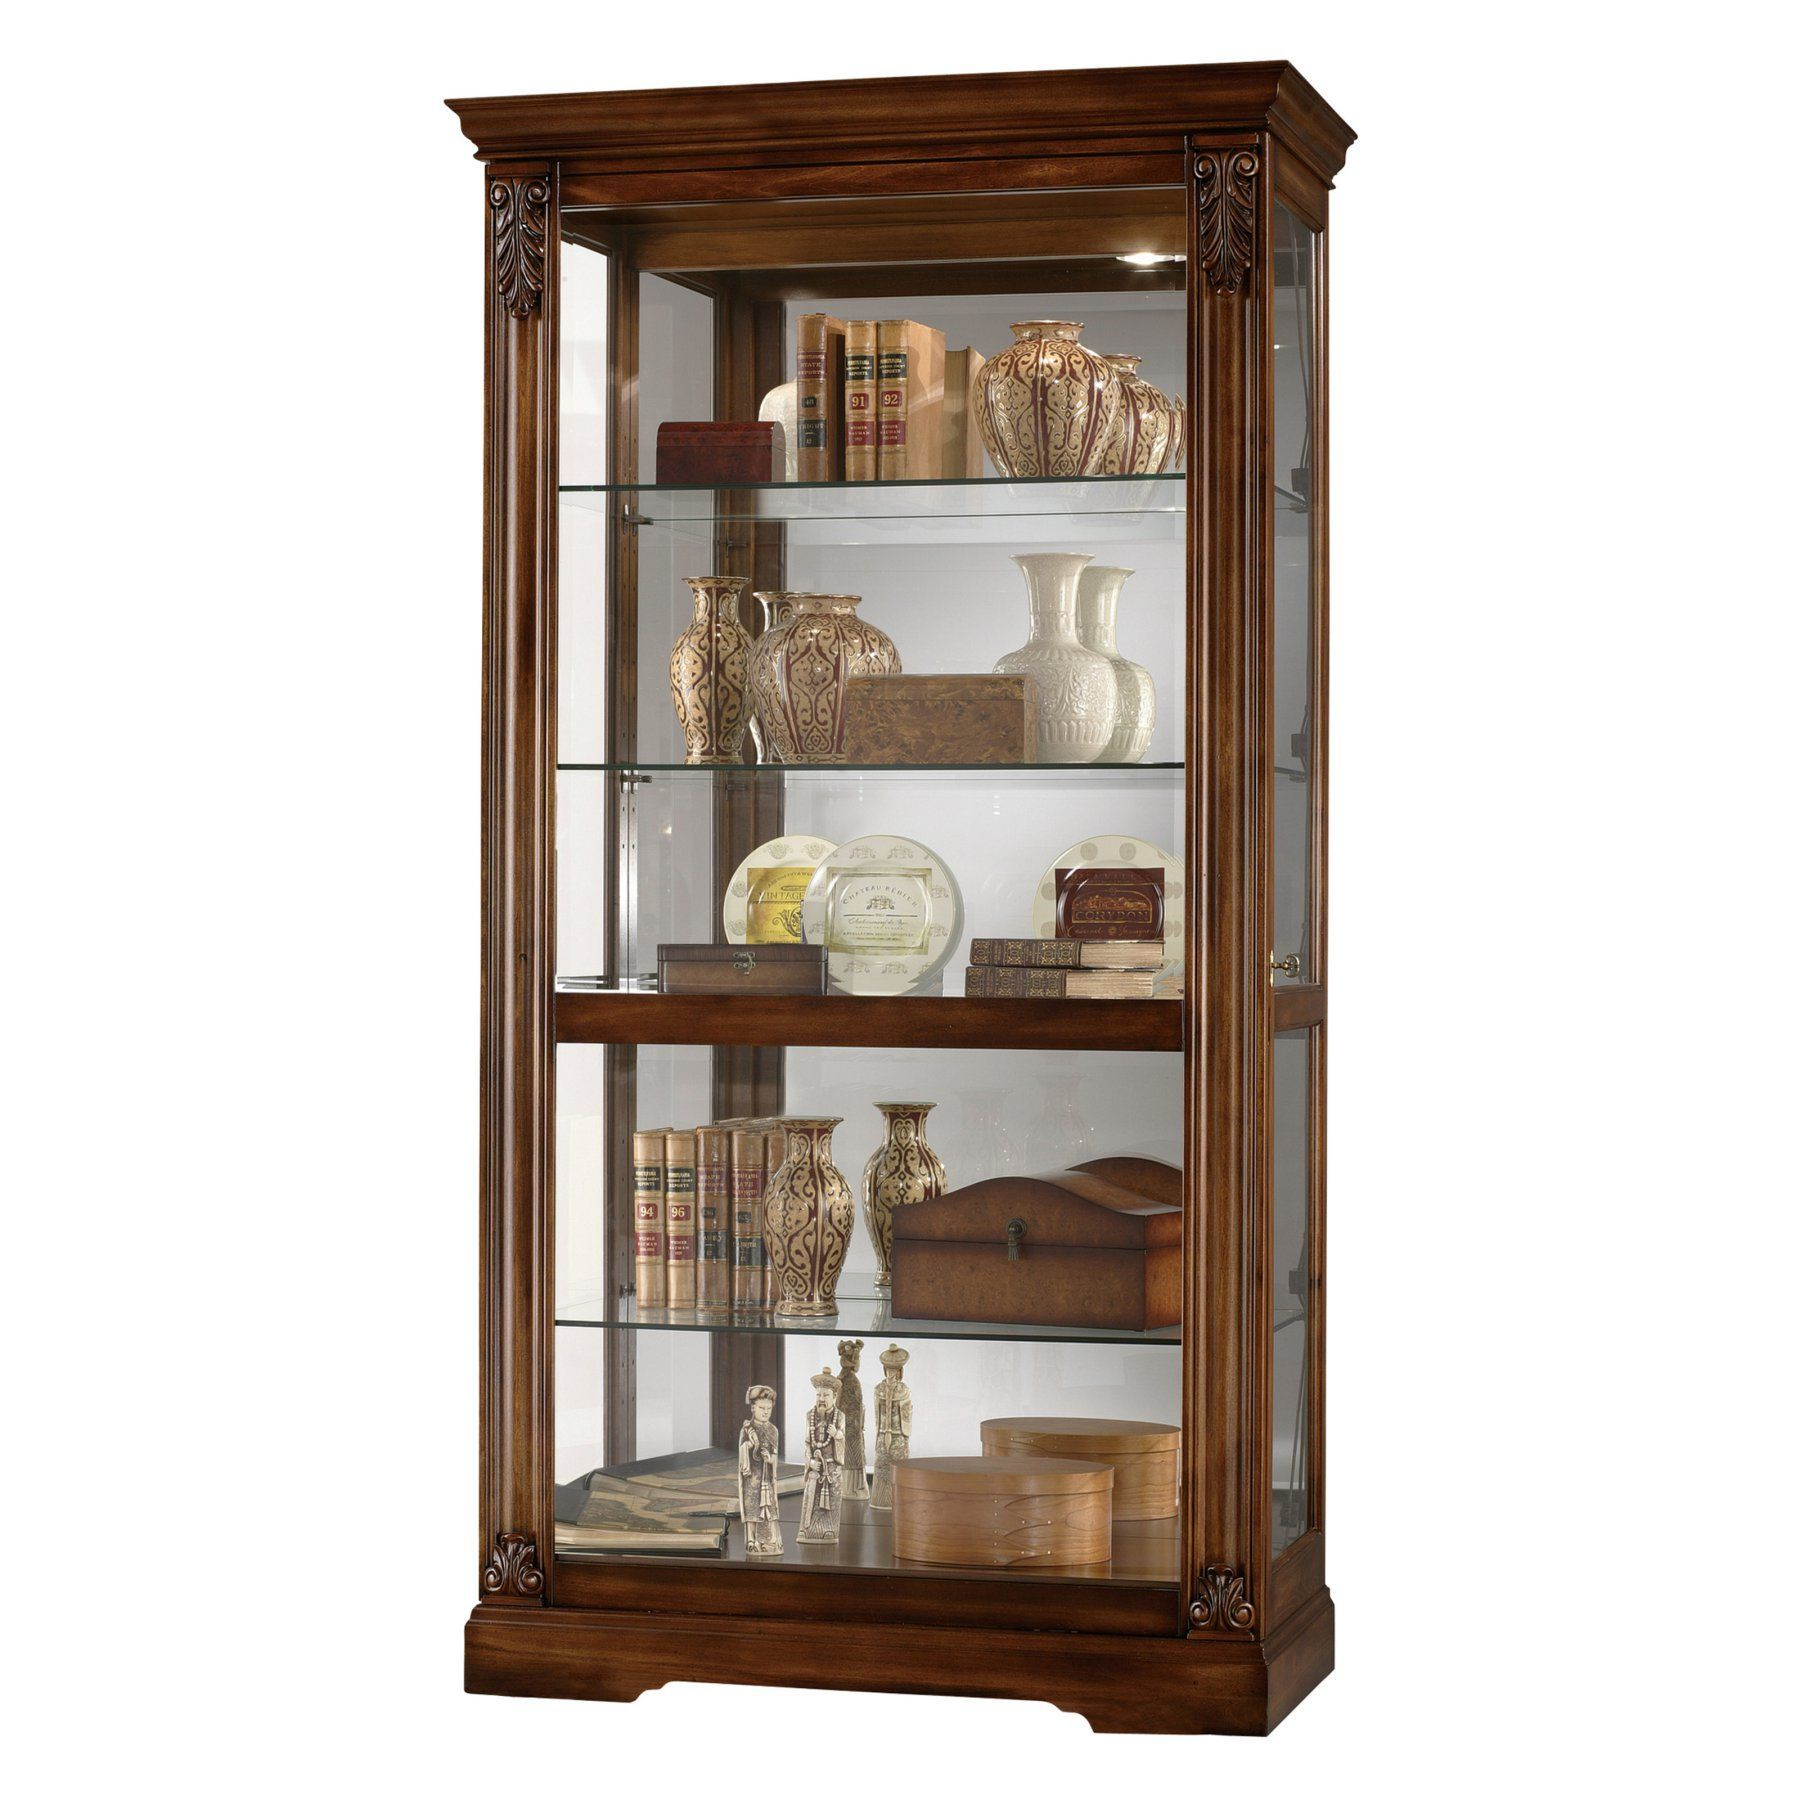 Andreus Curio Cabinet Curio Cabinet Furniture Trends China Cabinet